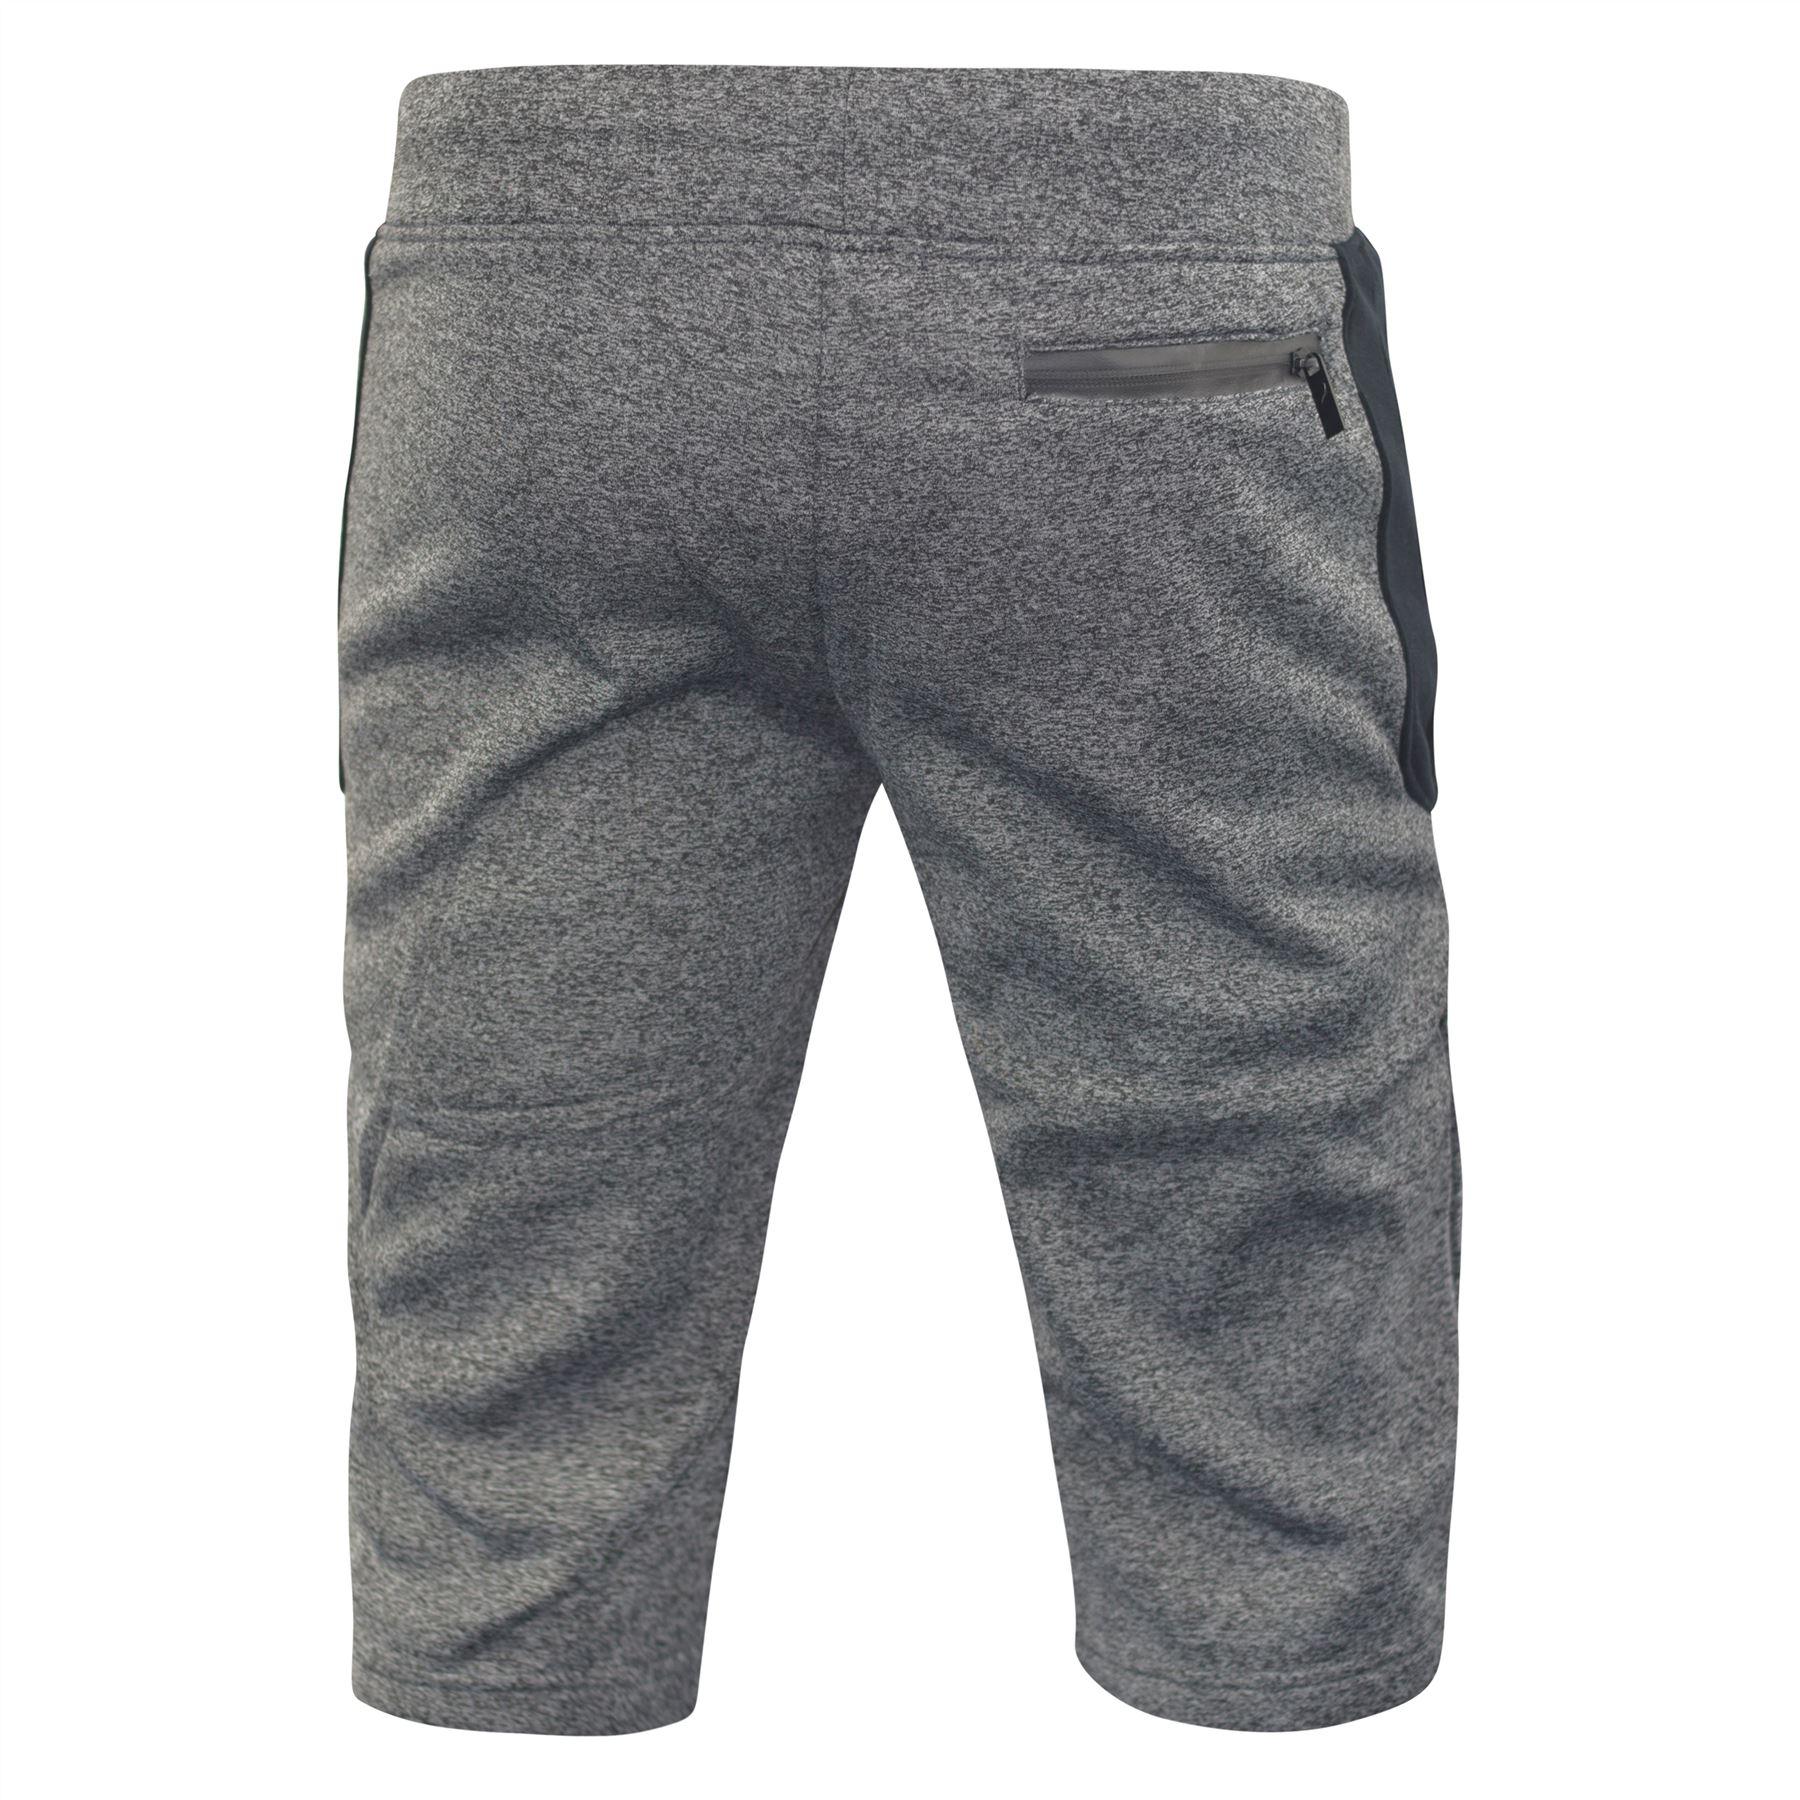 Mens-Jogger-3-4-Shorts-D-Rock-Half-Pants-Sport-Trousers-Casual-Bottom thumbnail 3